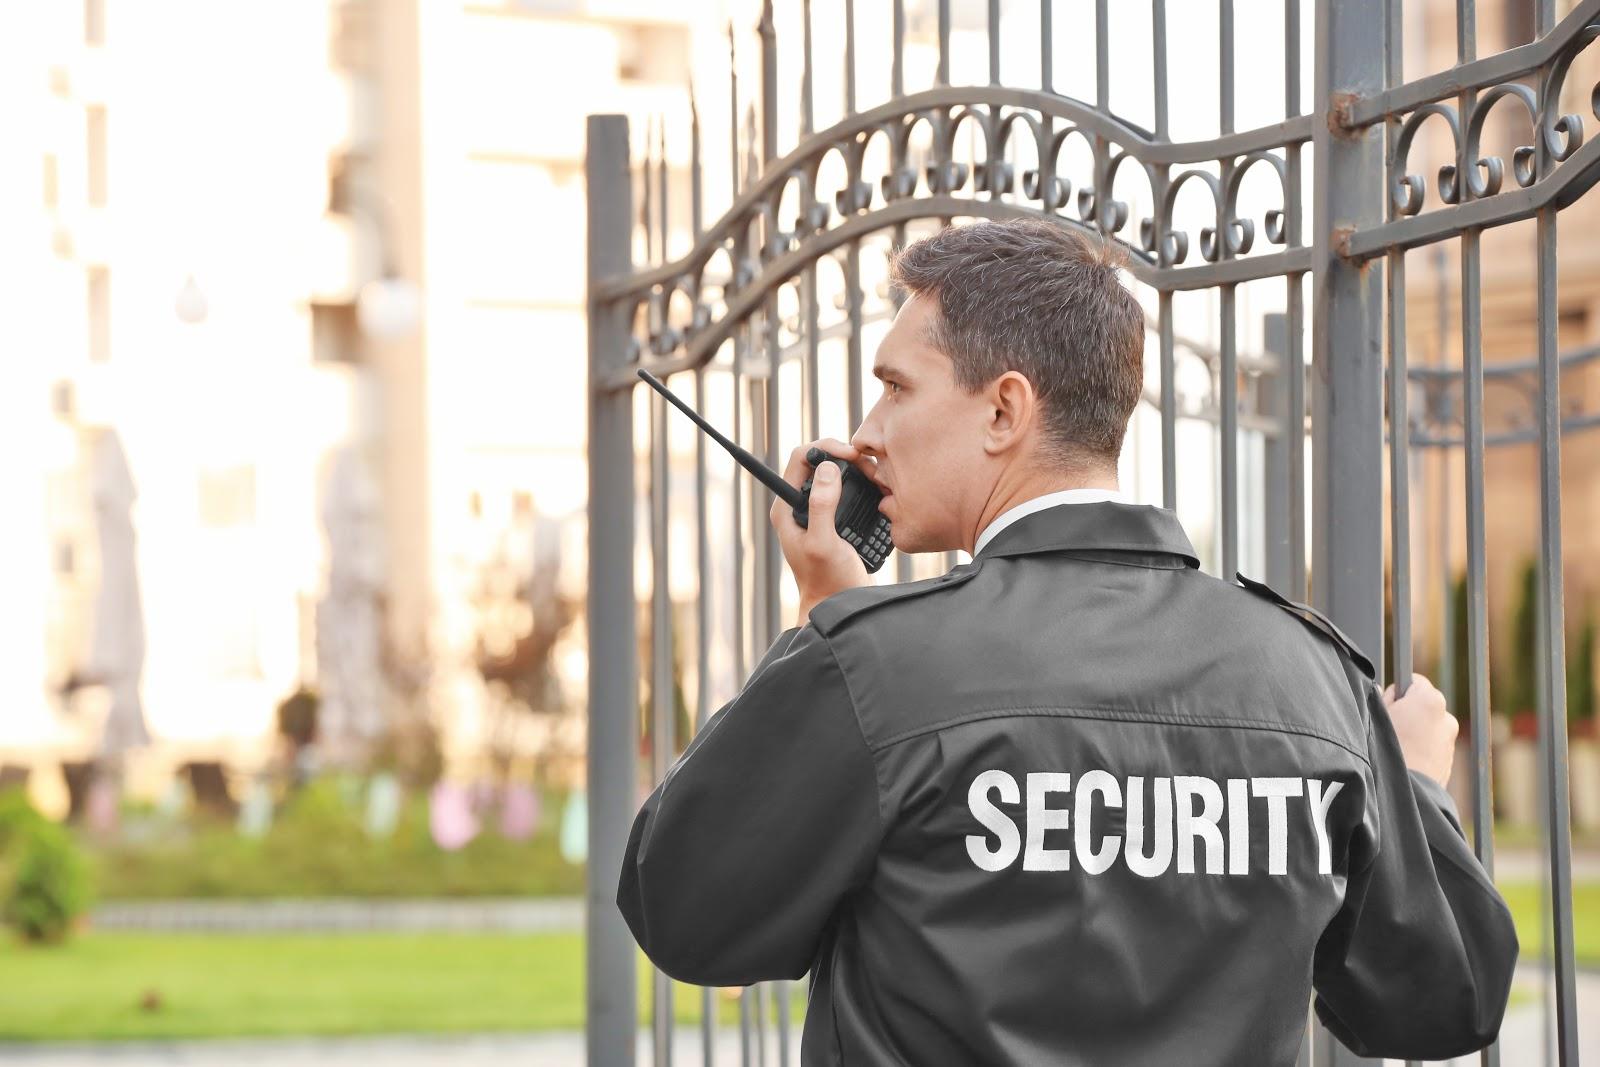 Securelion Security Guard in Bay Area